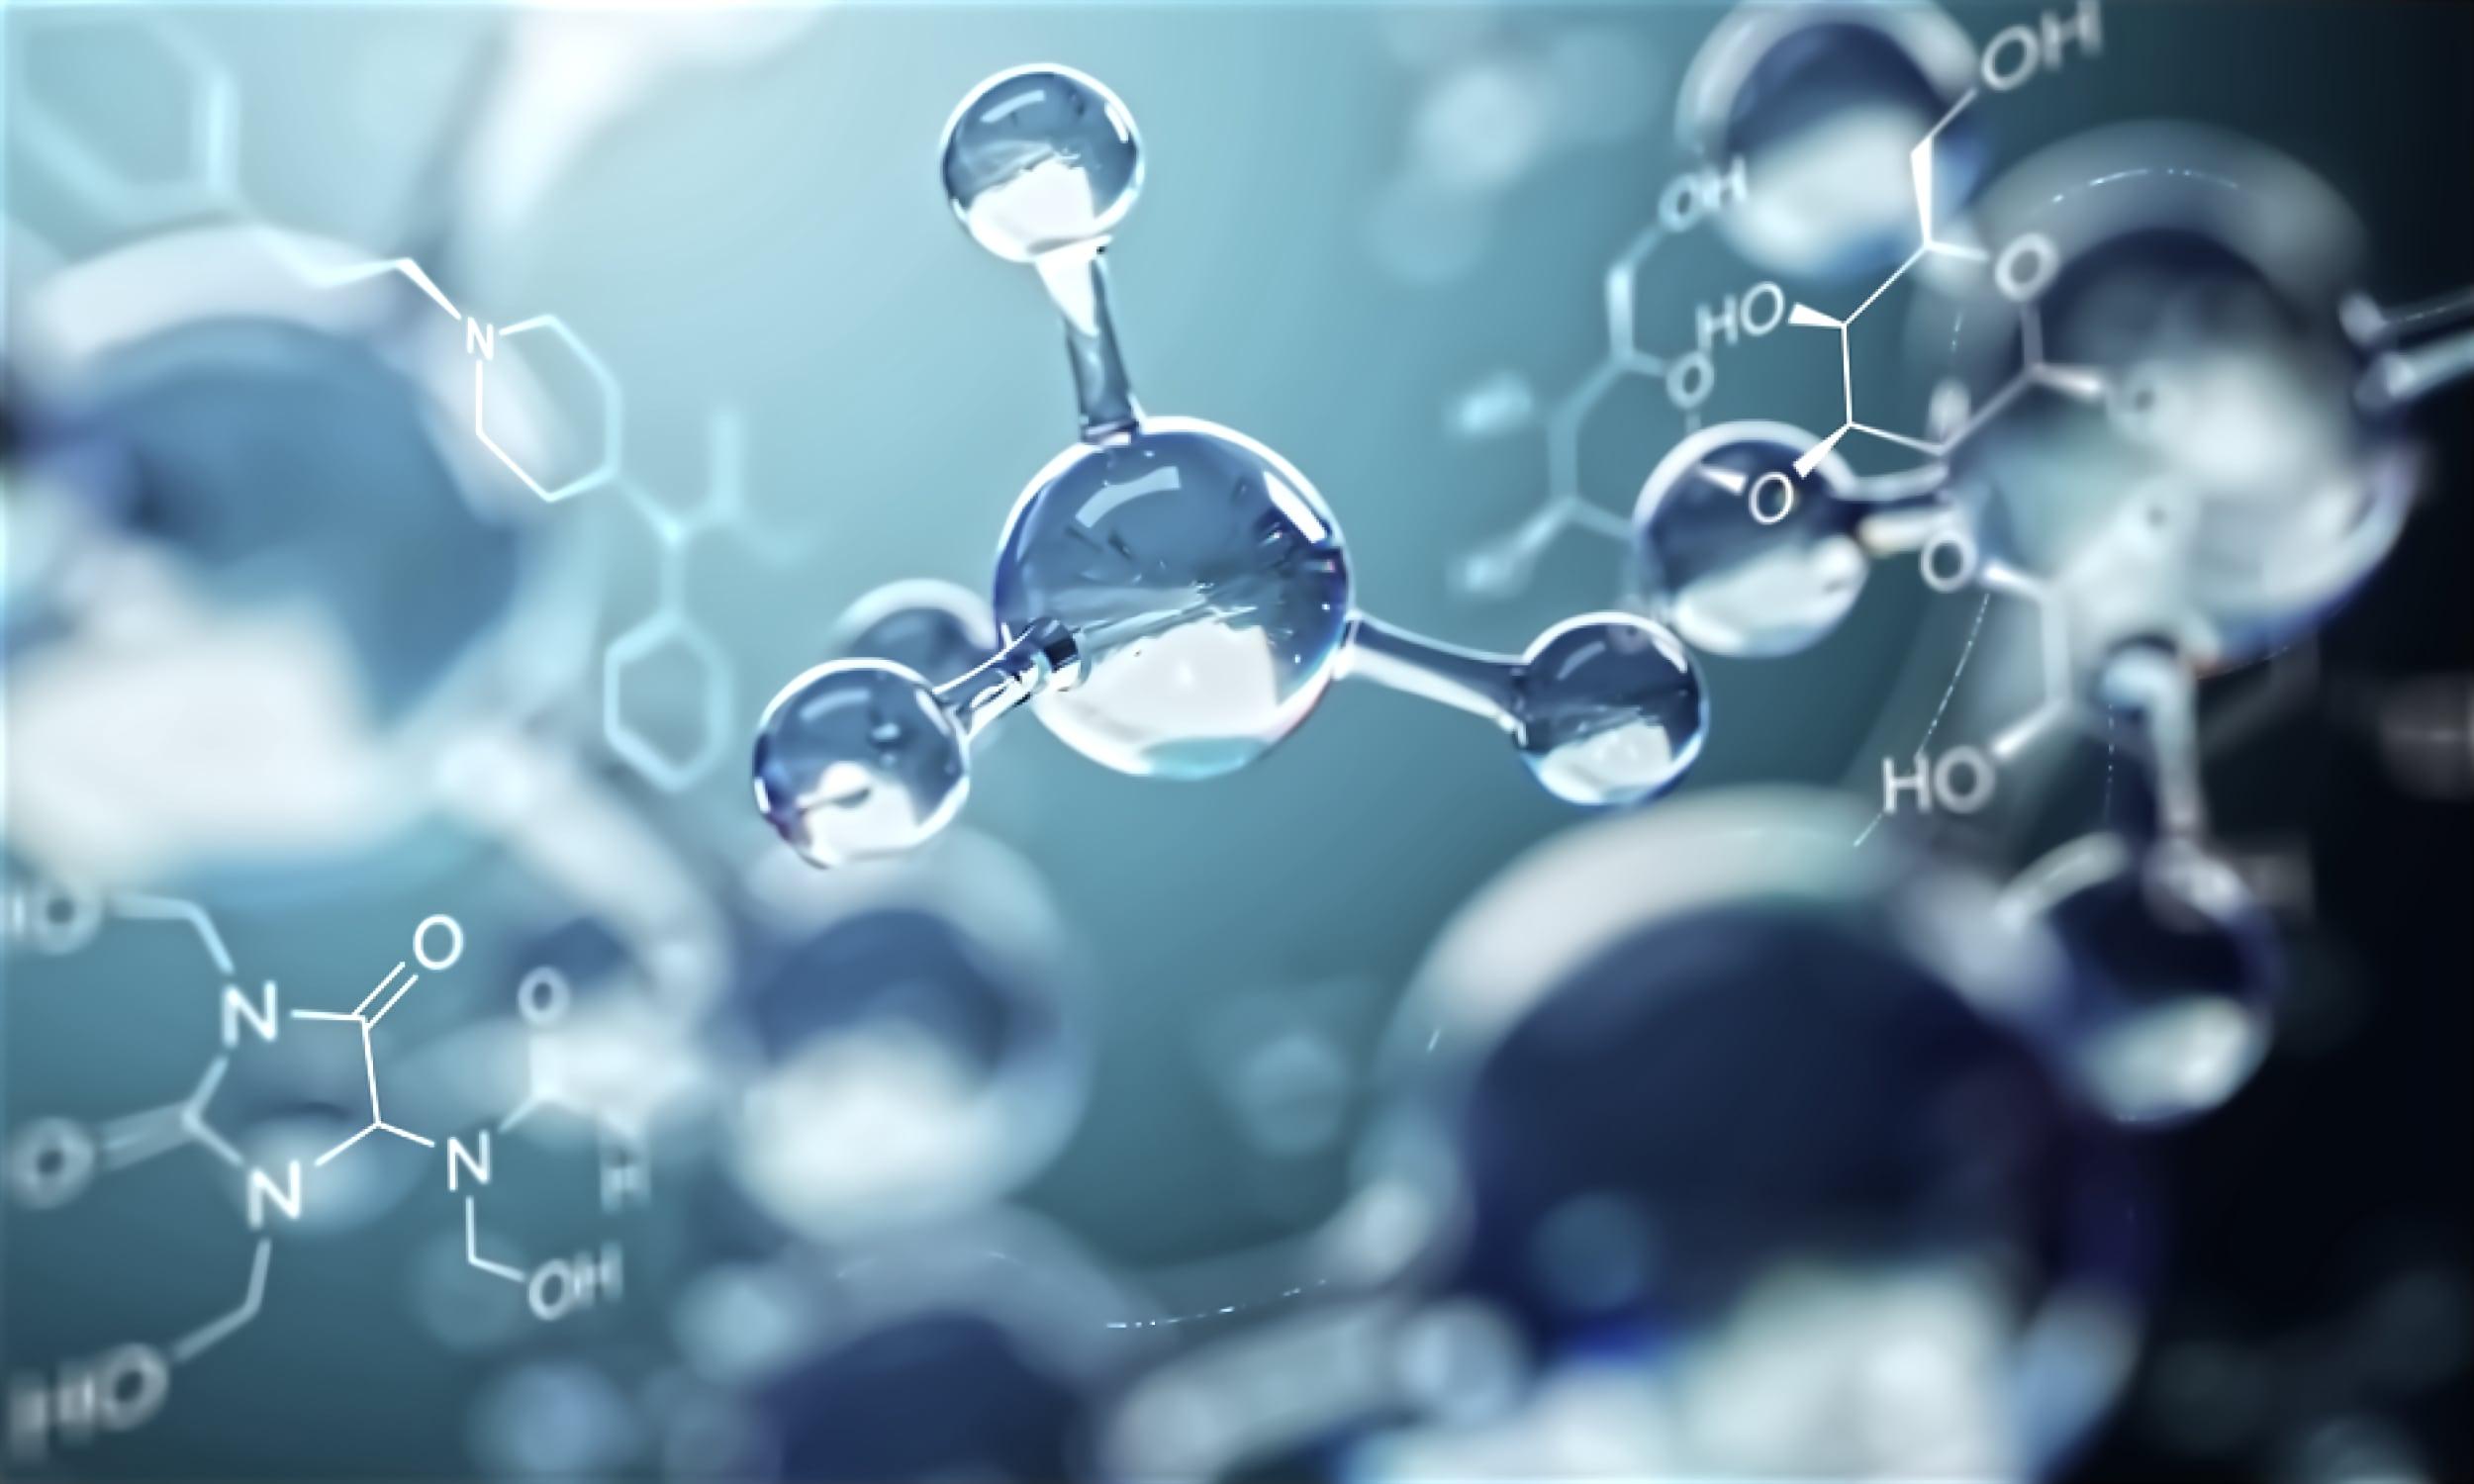 Rivestimenti polimerici